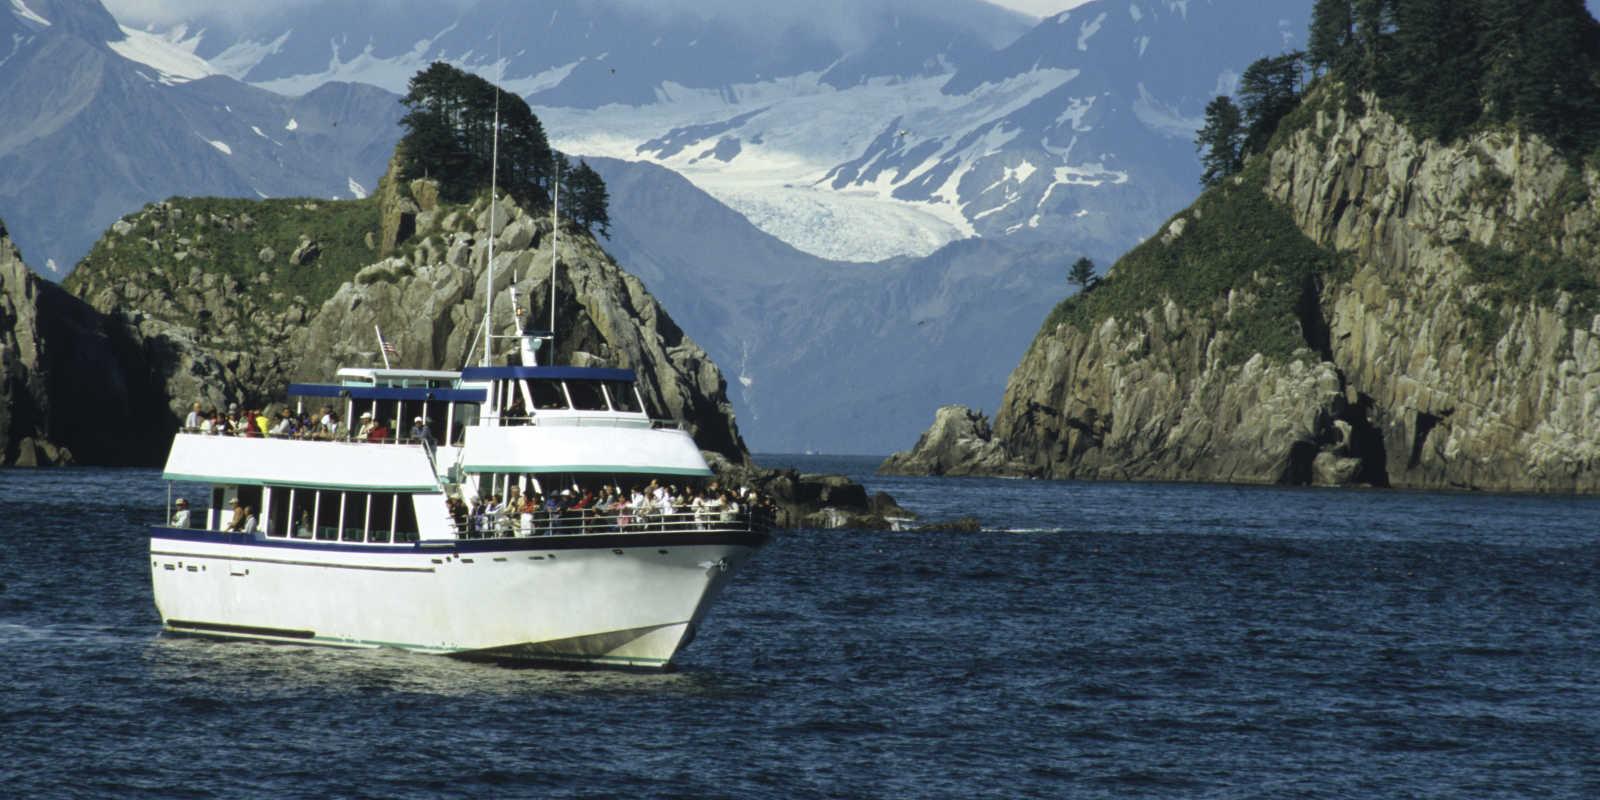 Kenai Fjords National Park Visit Anchorage